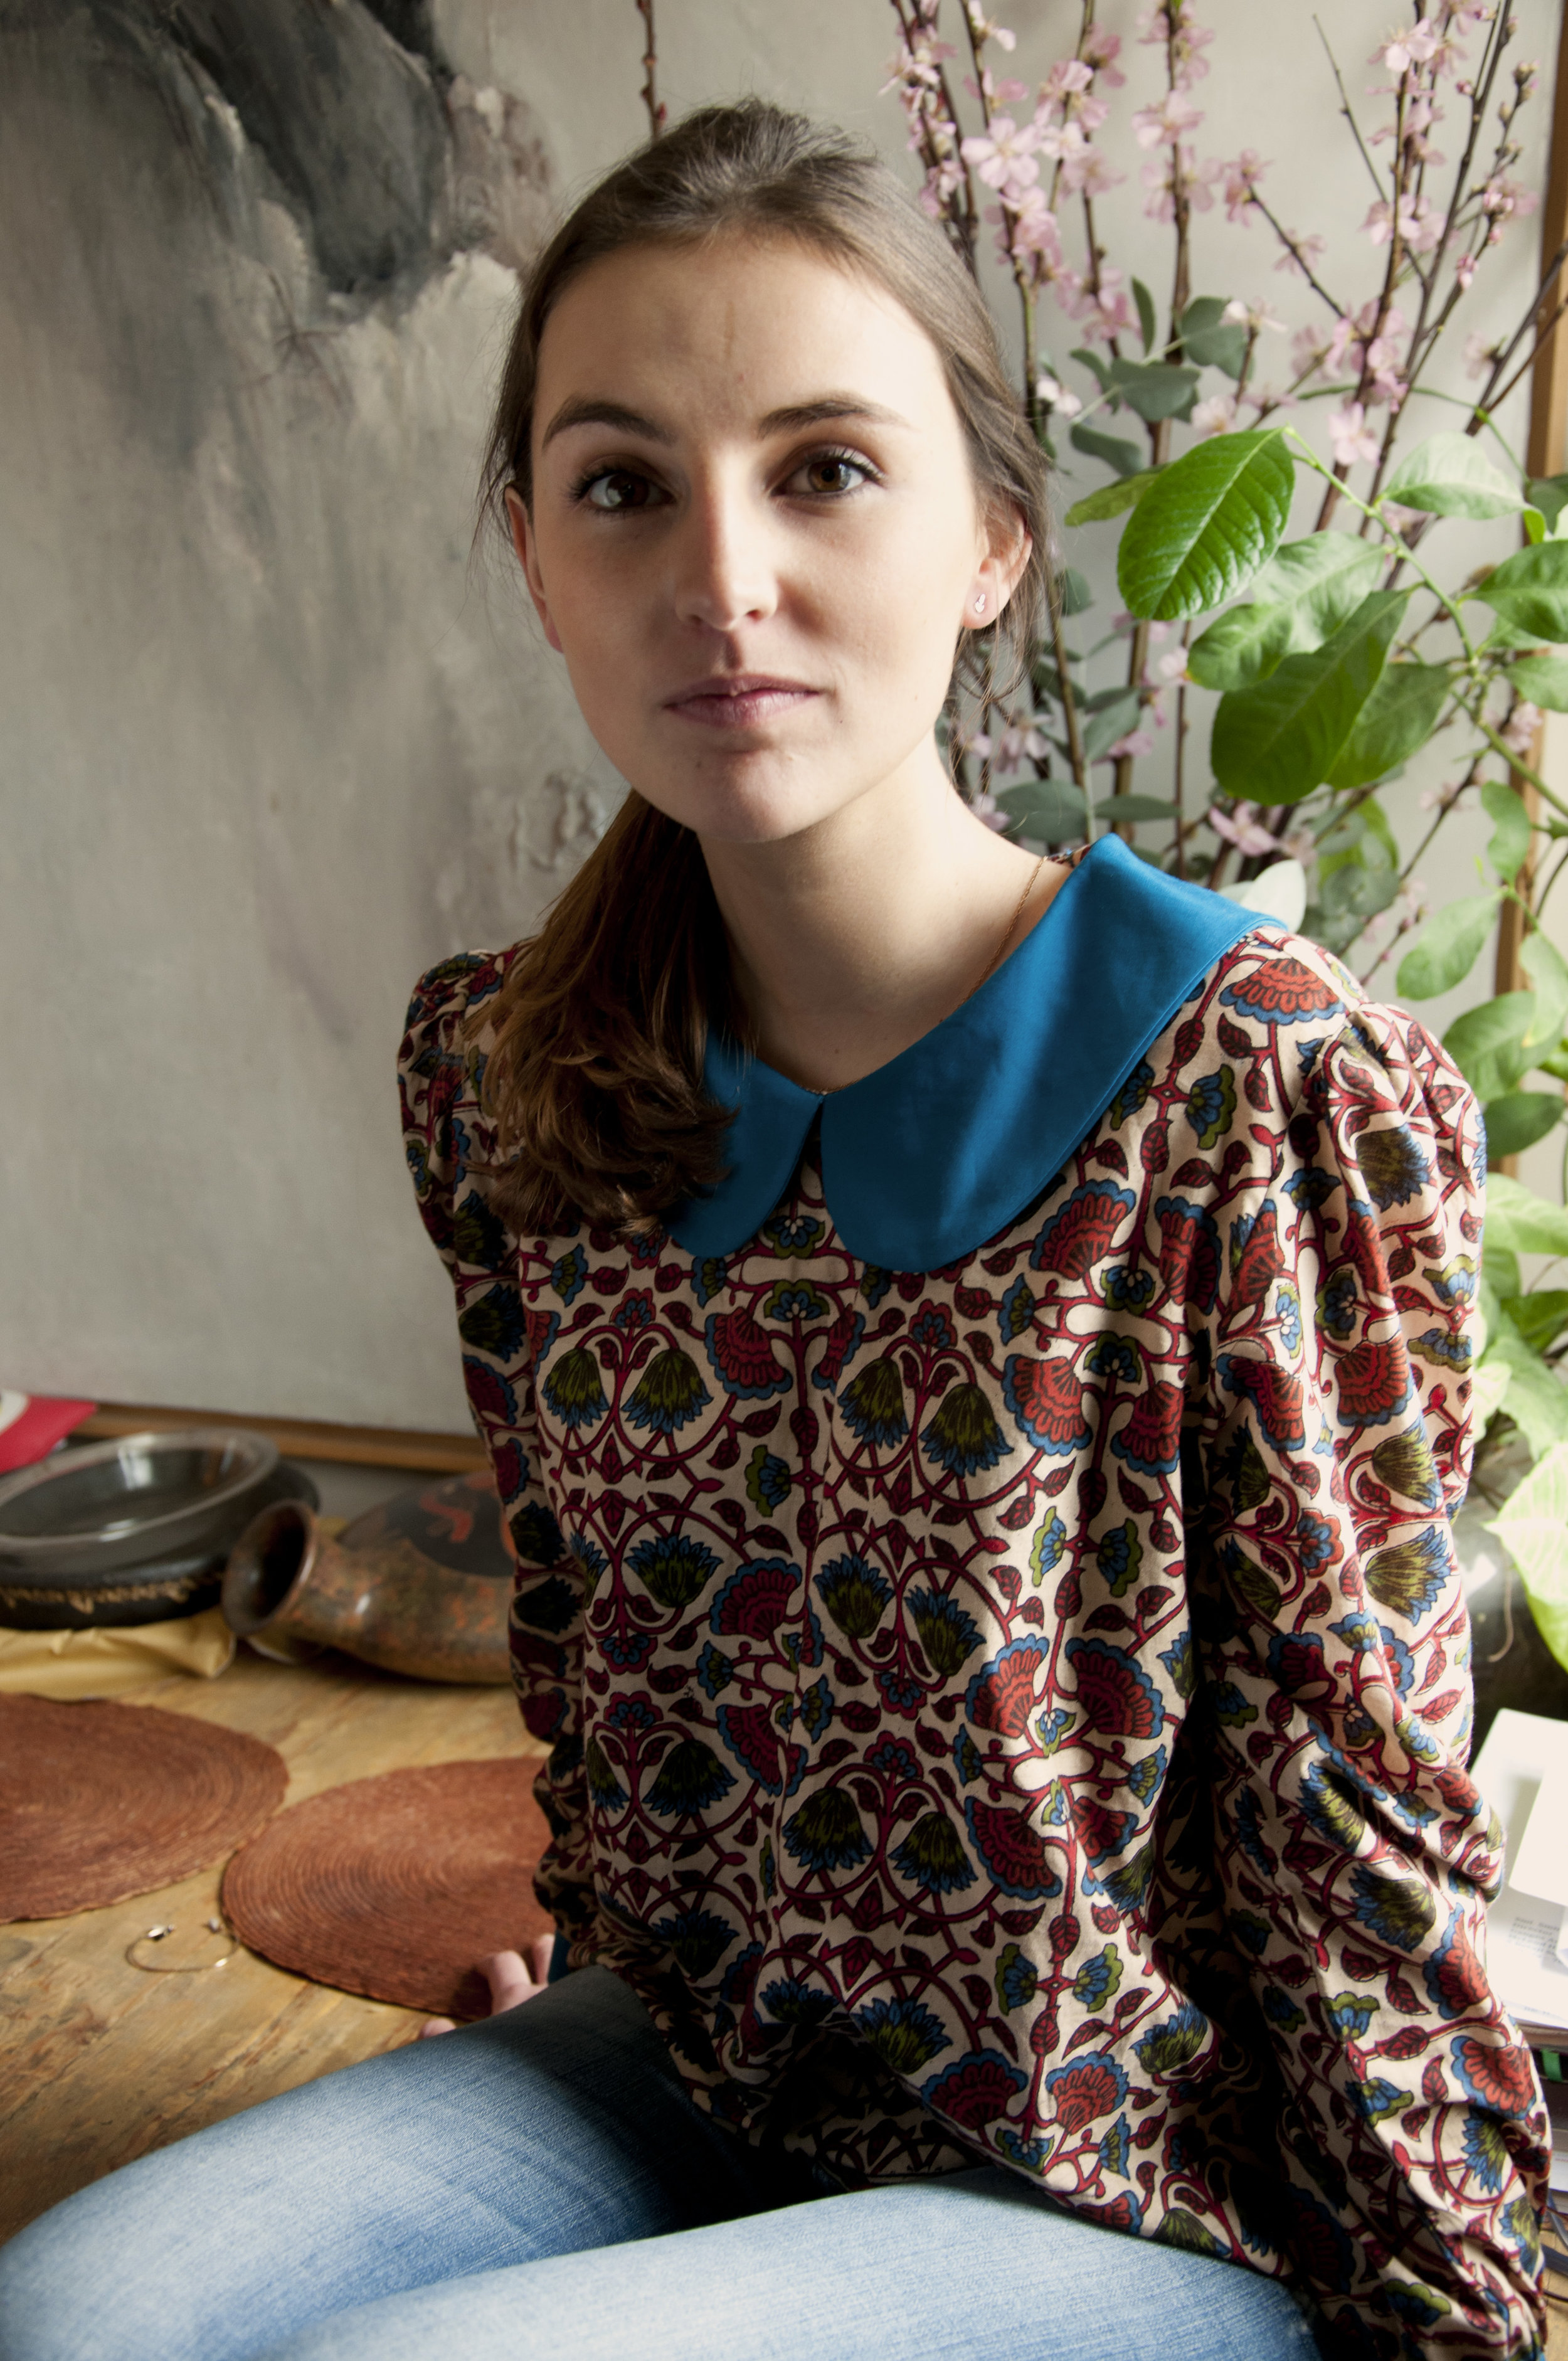 MATILDA_BROWN_TOP_CHARZA